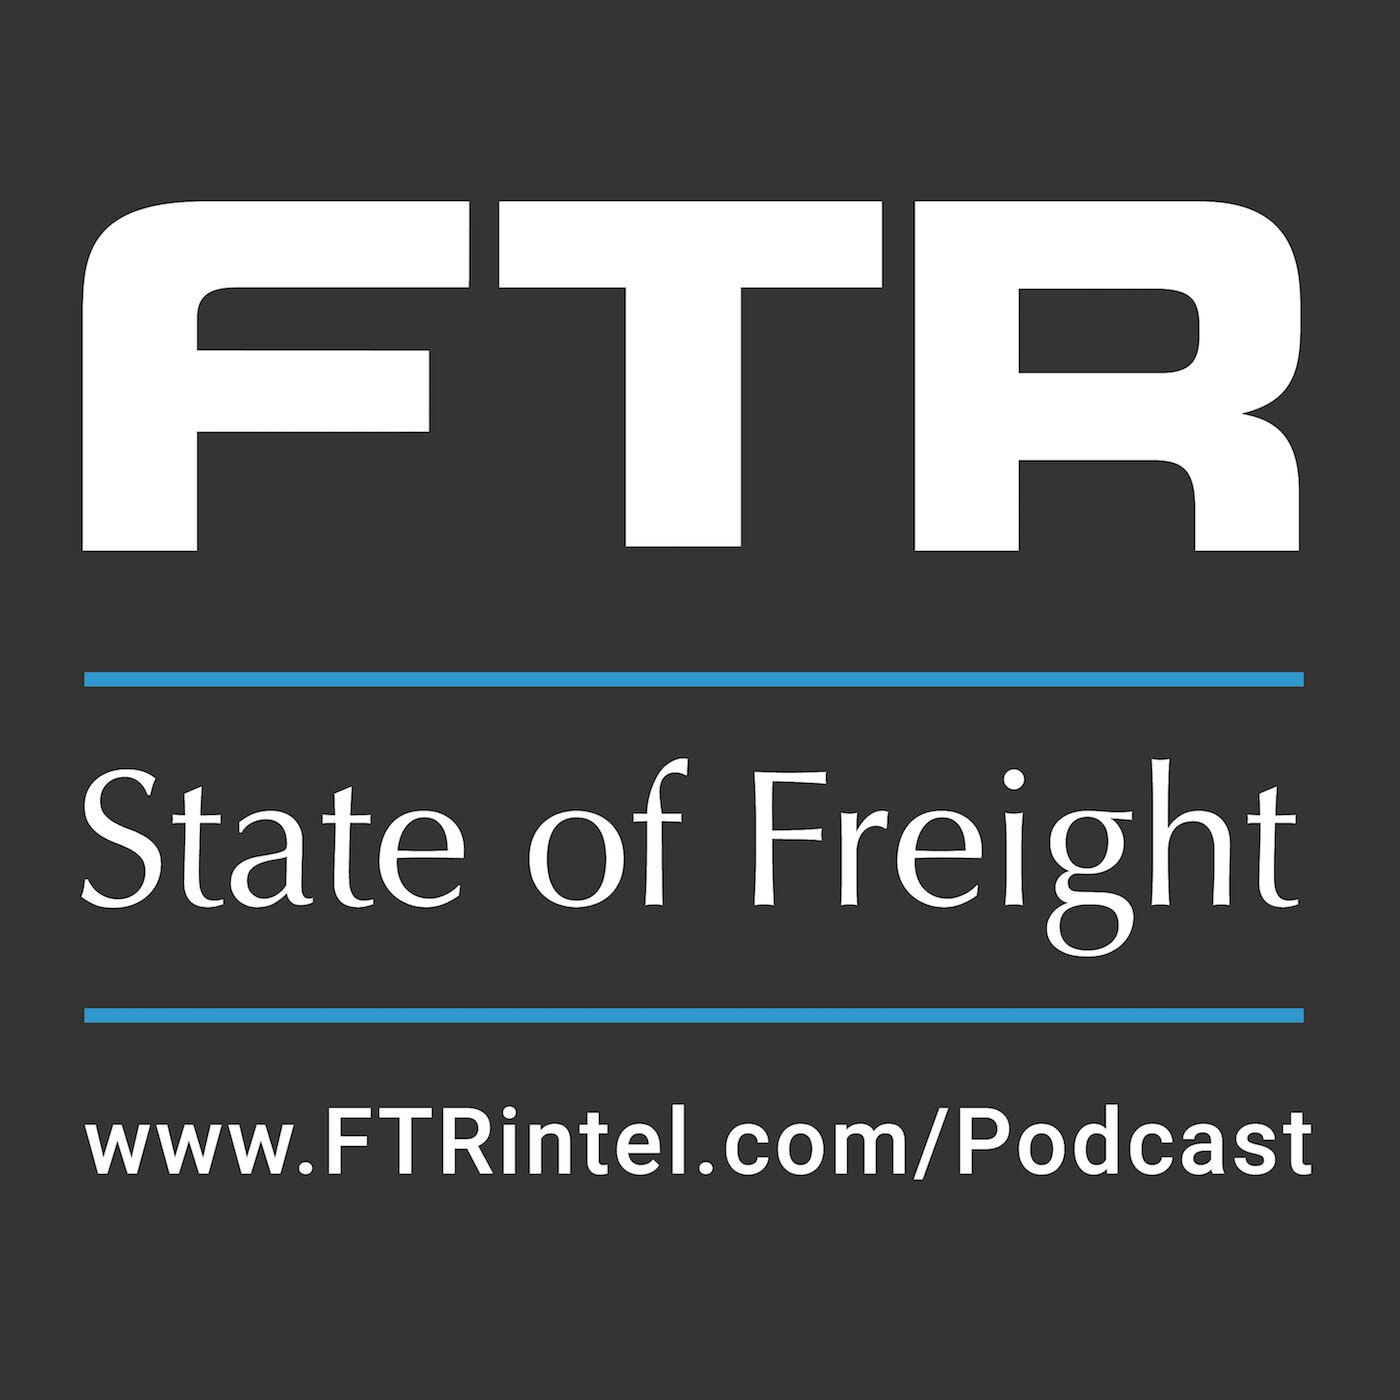 Rail Market Update - Demurrage and Accessorial Fees